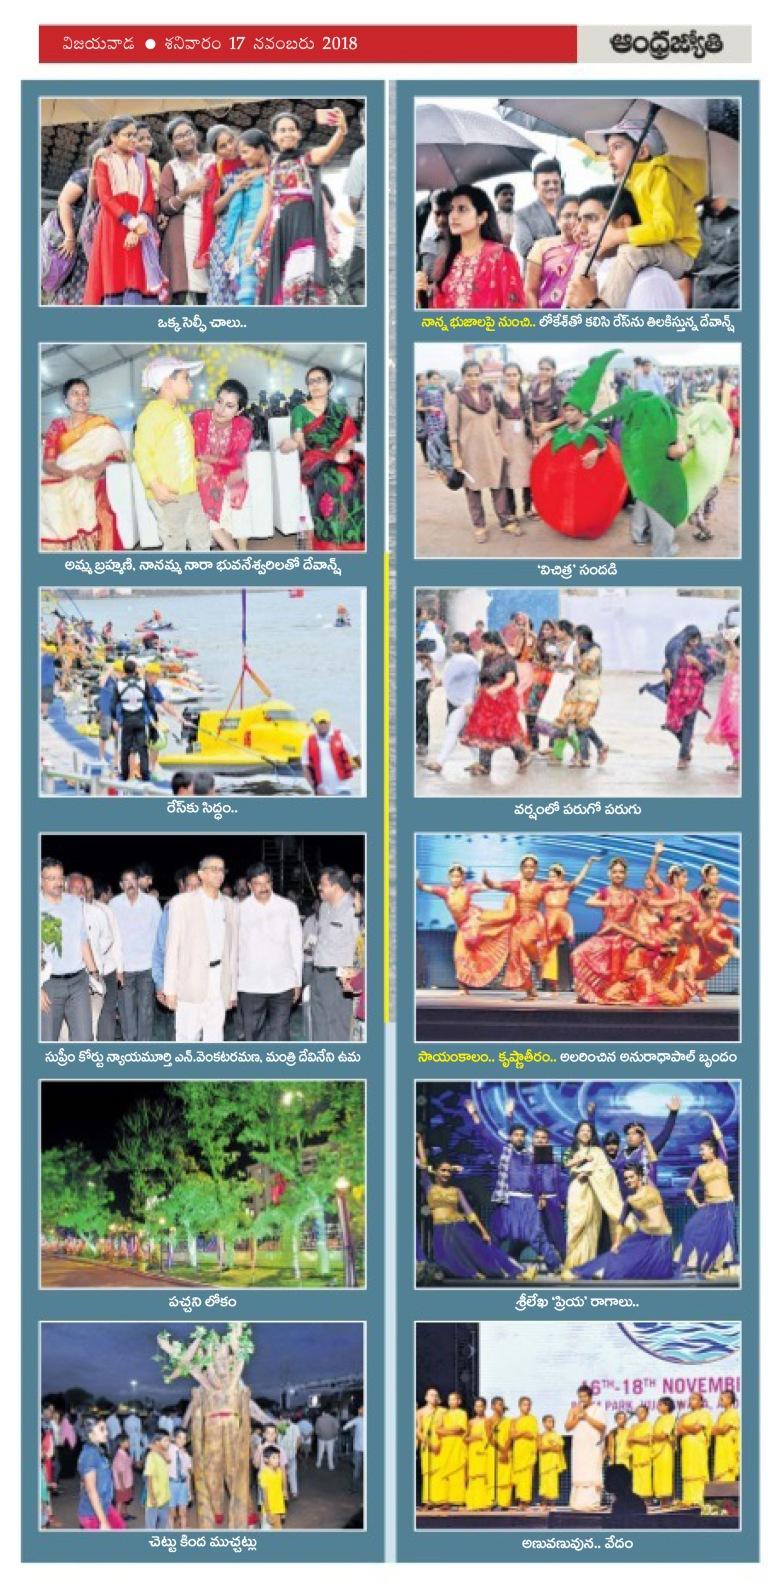 17-11-2018 F1H2O News Clip Jyothy Vja pg4